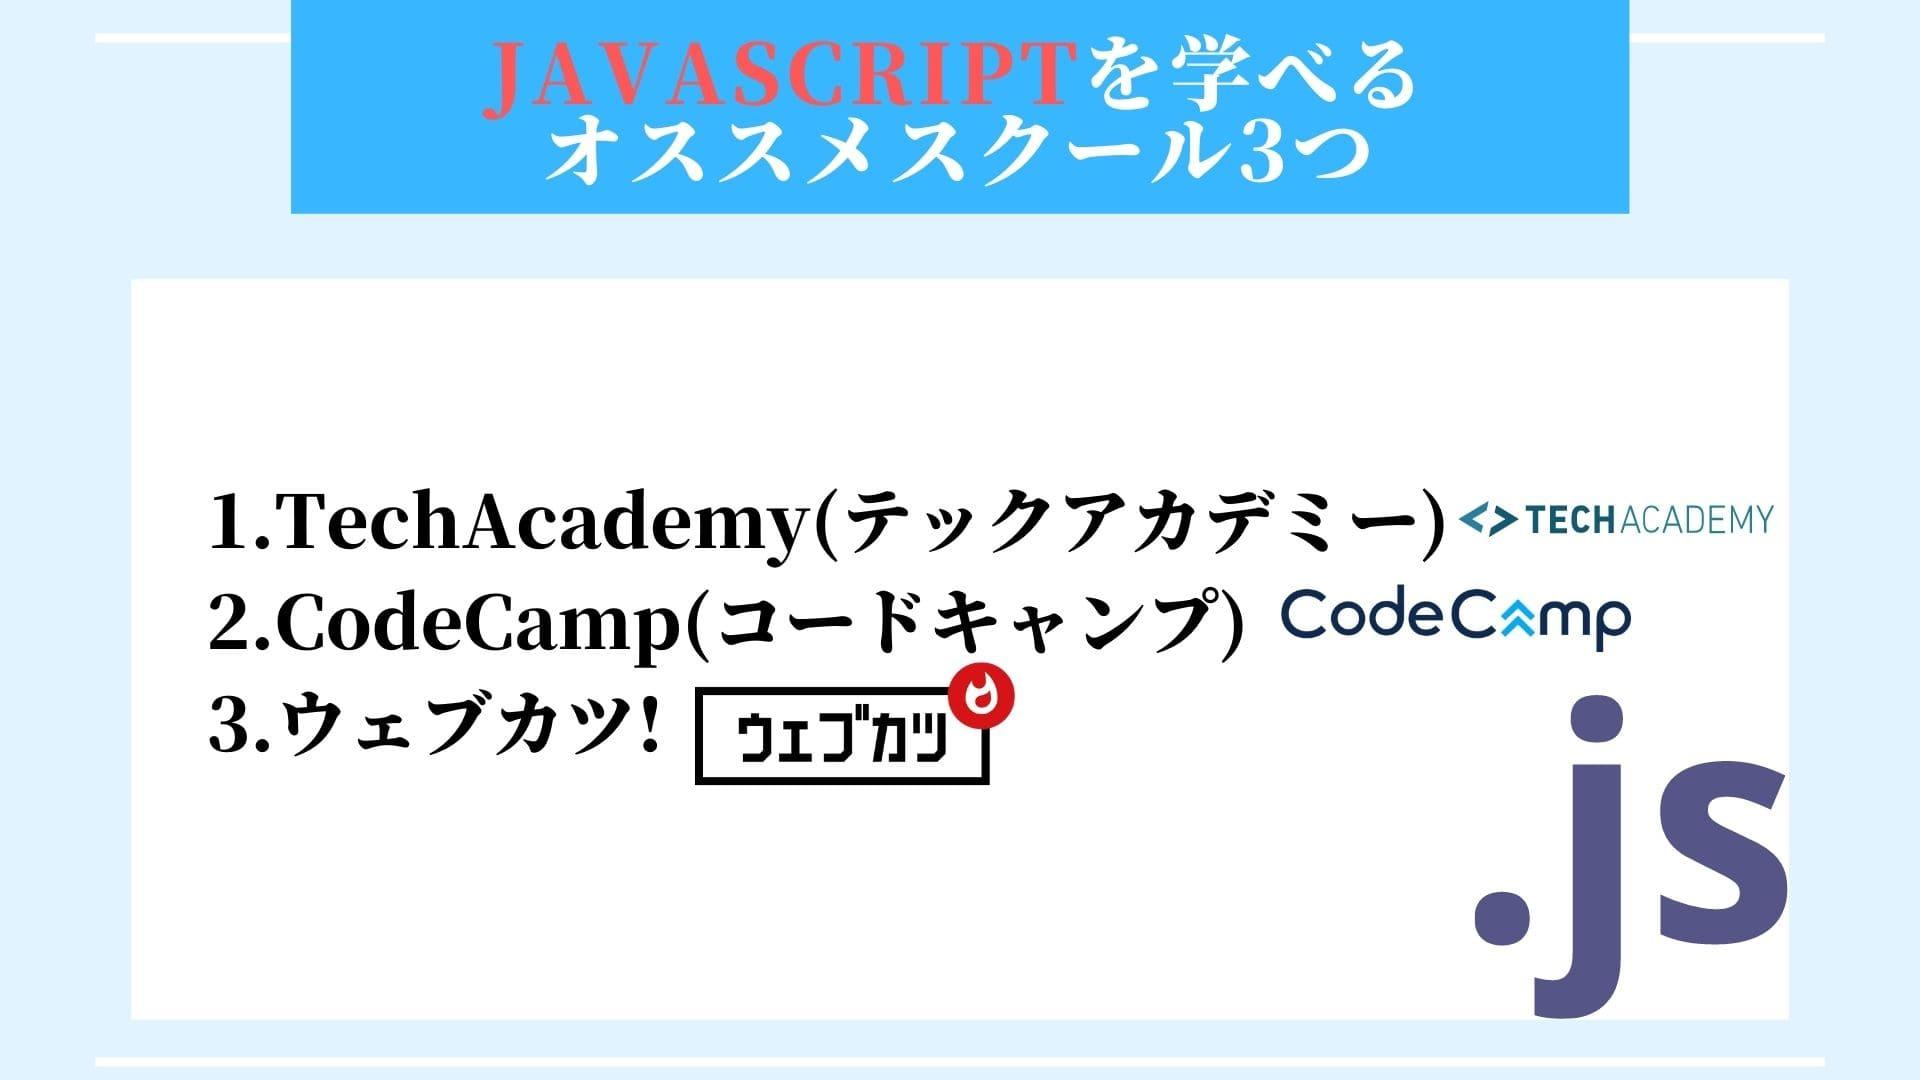 JavaScript オススメスクール